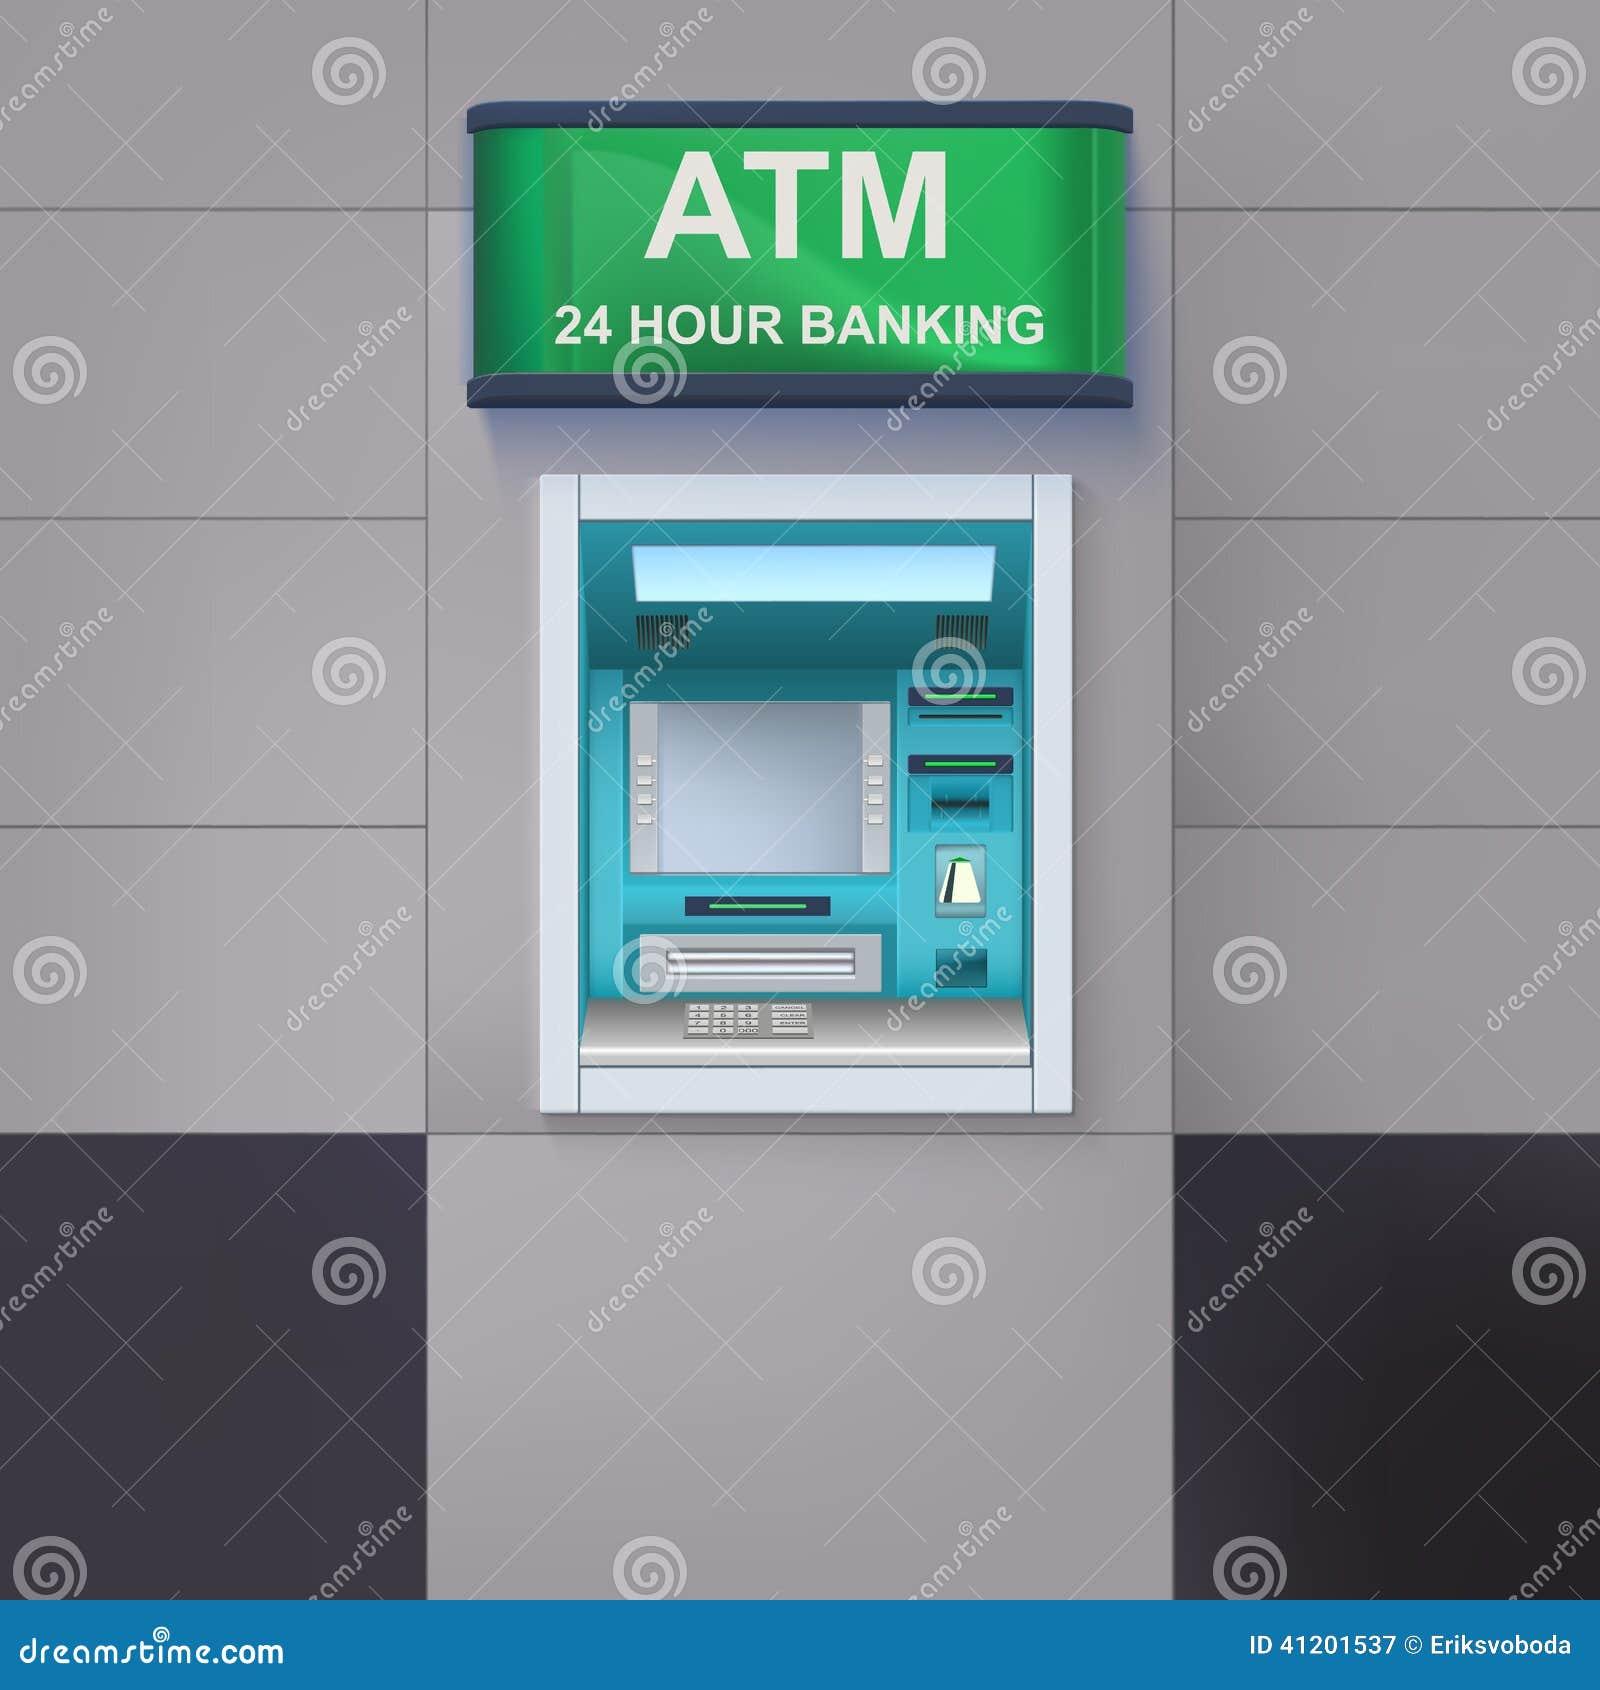 Starting an ATM Business – Sample Business Plan Template